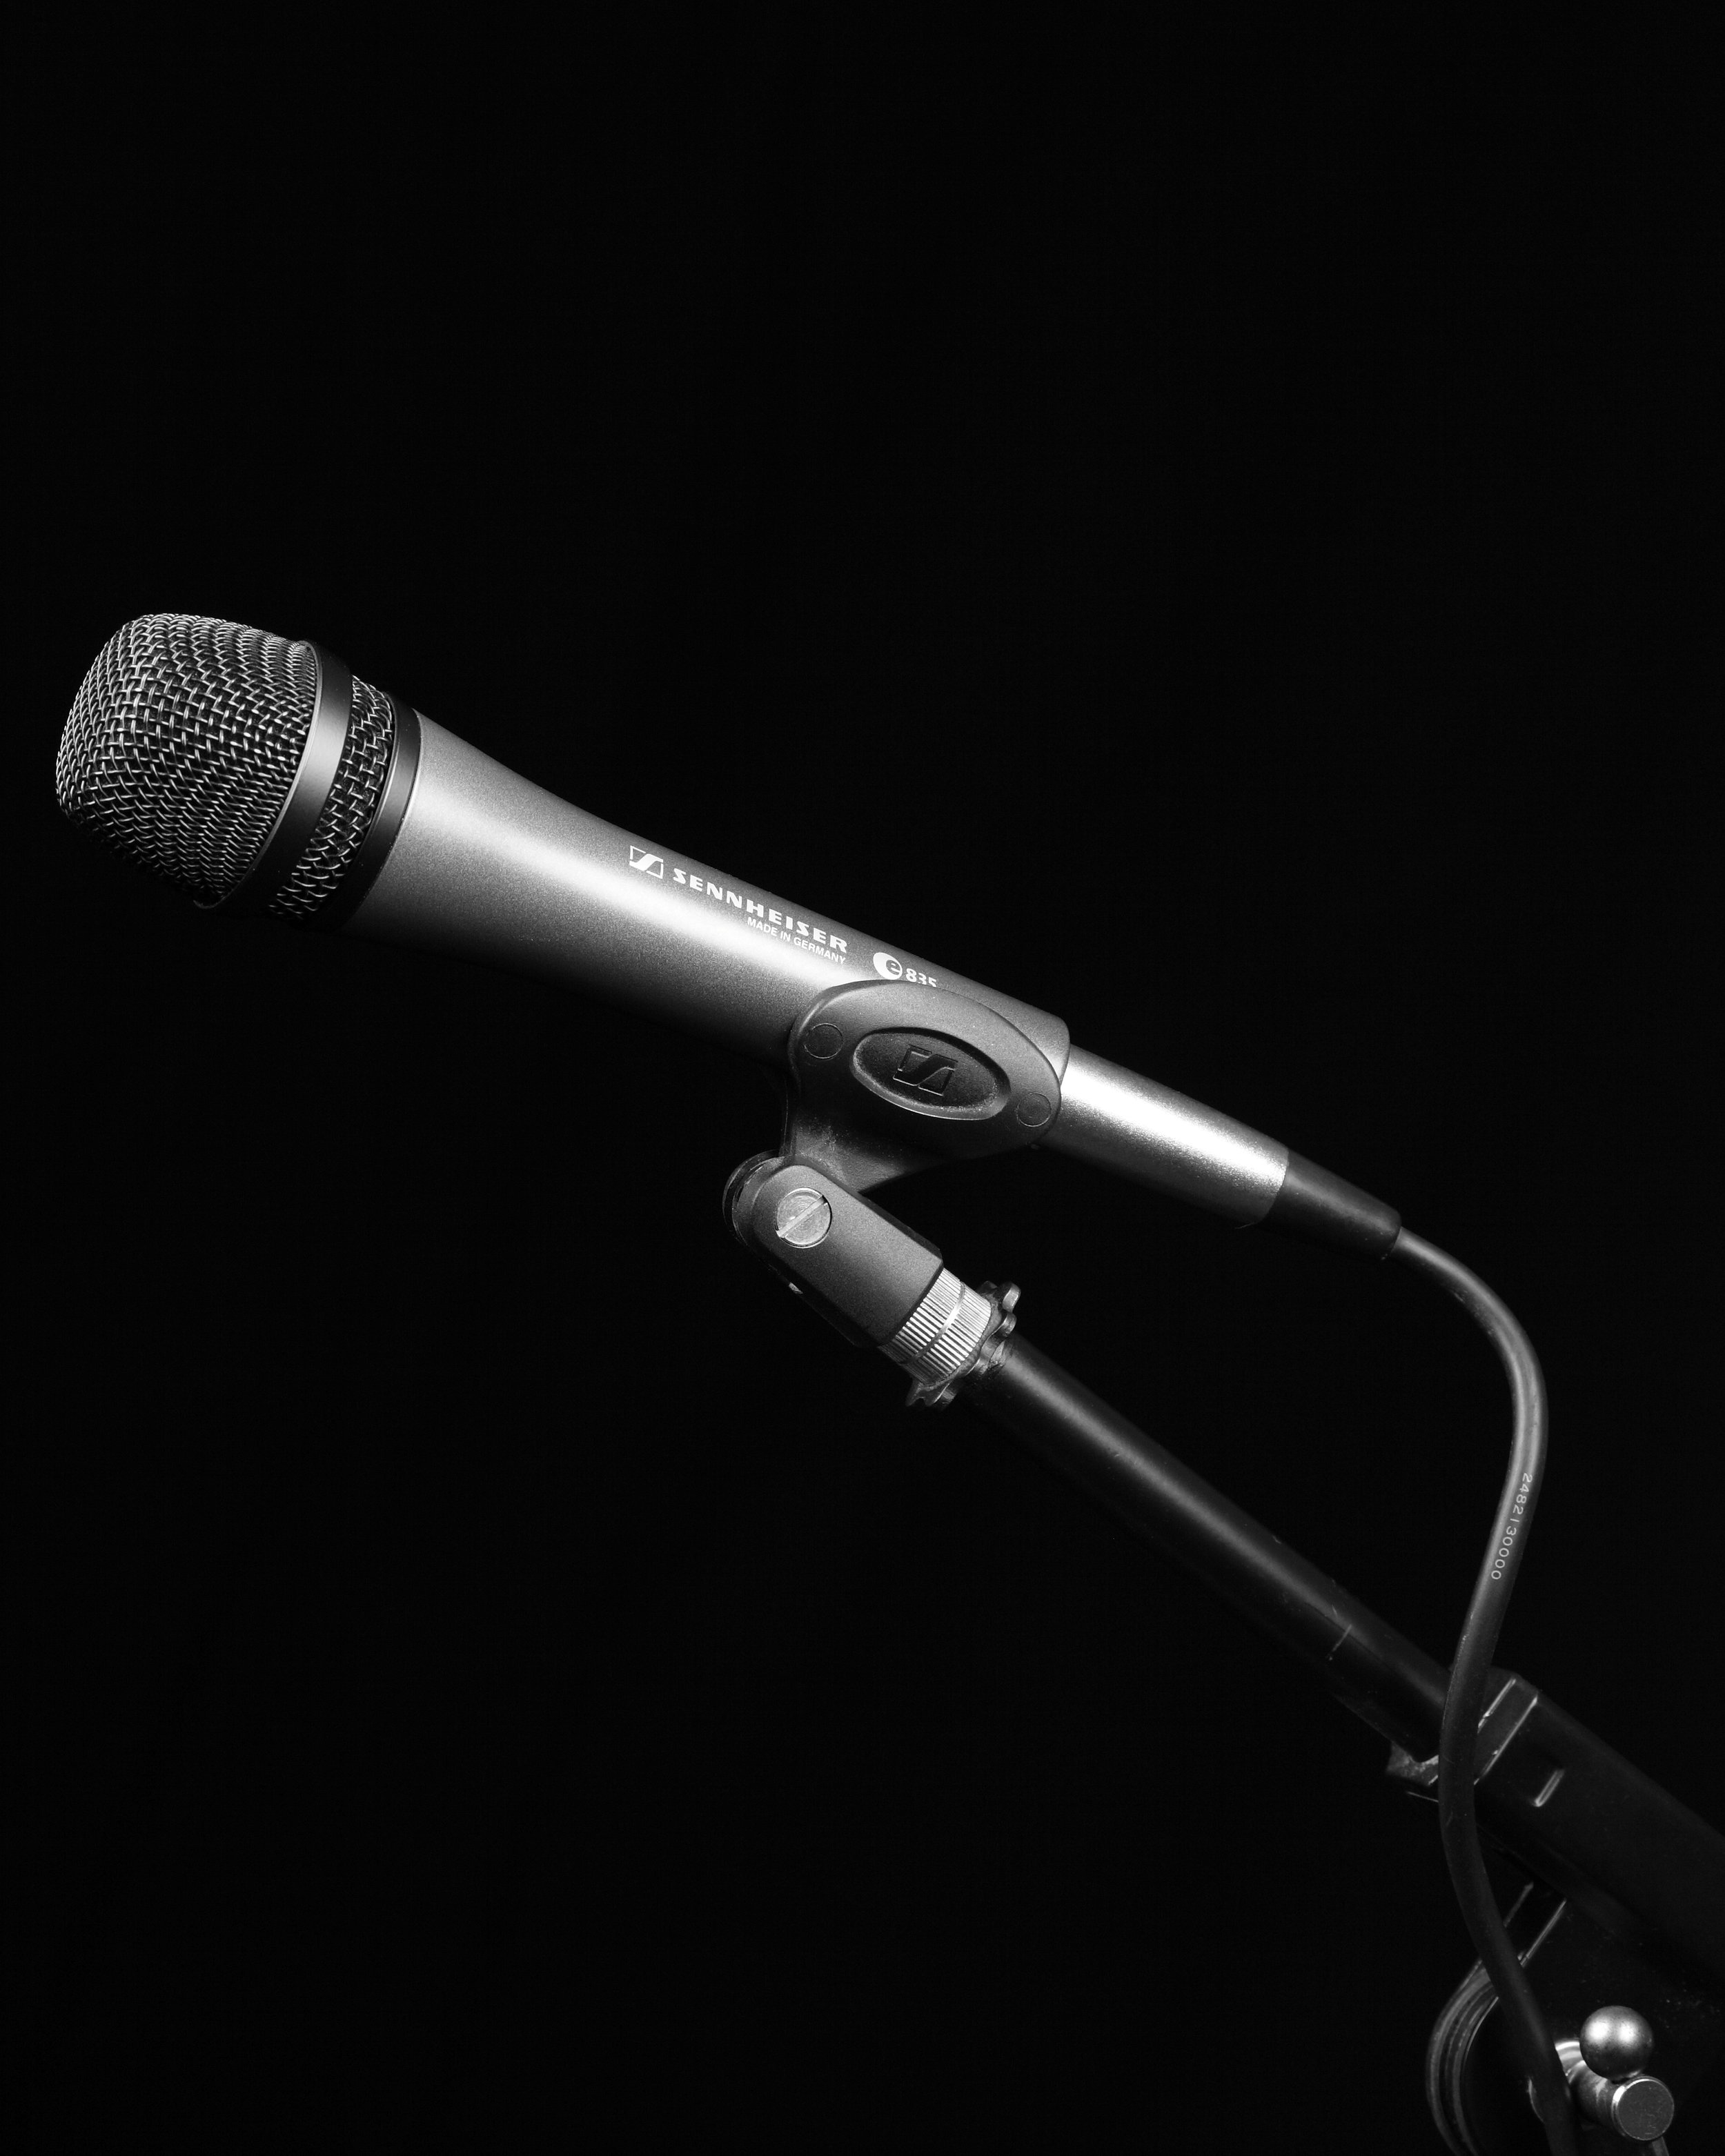 IMG_0001-mic.JPG